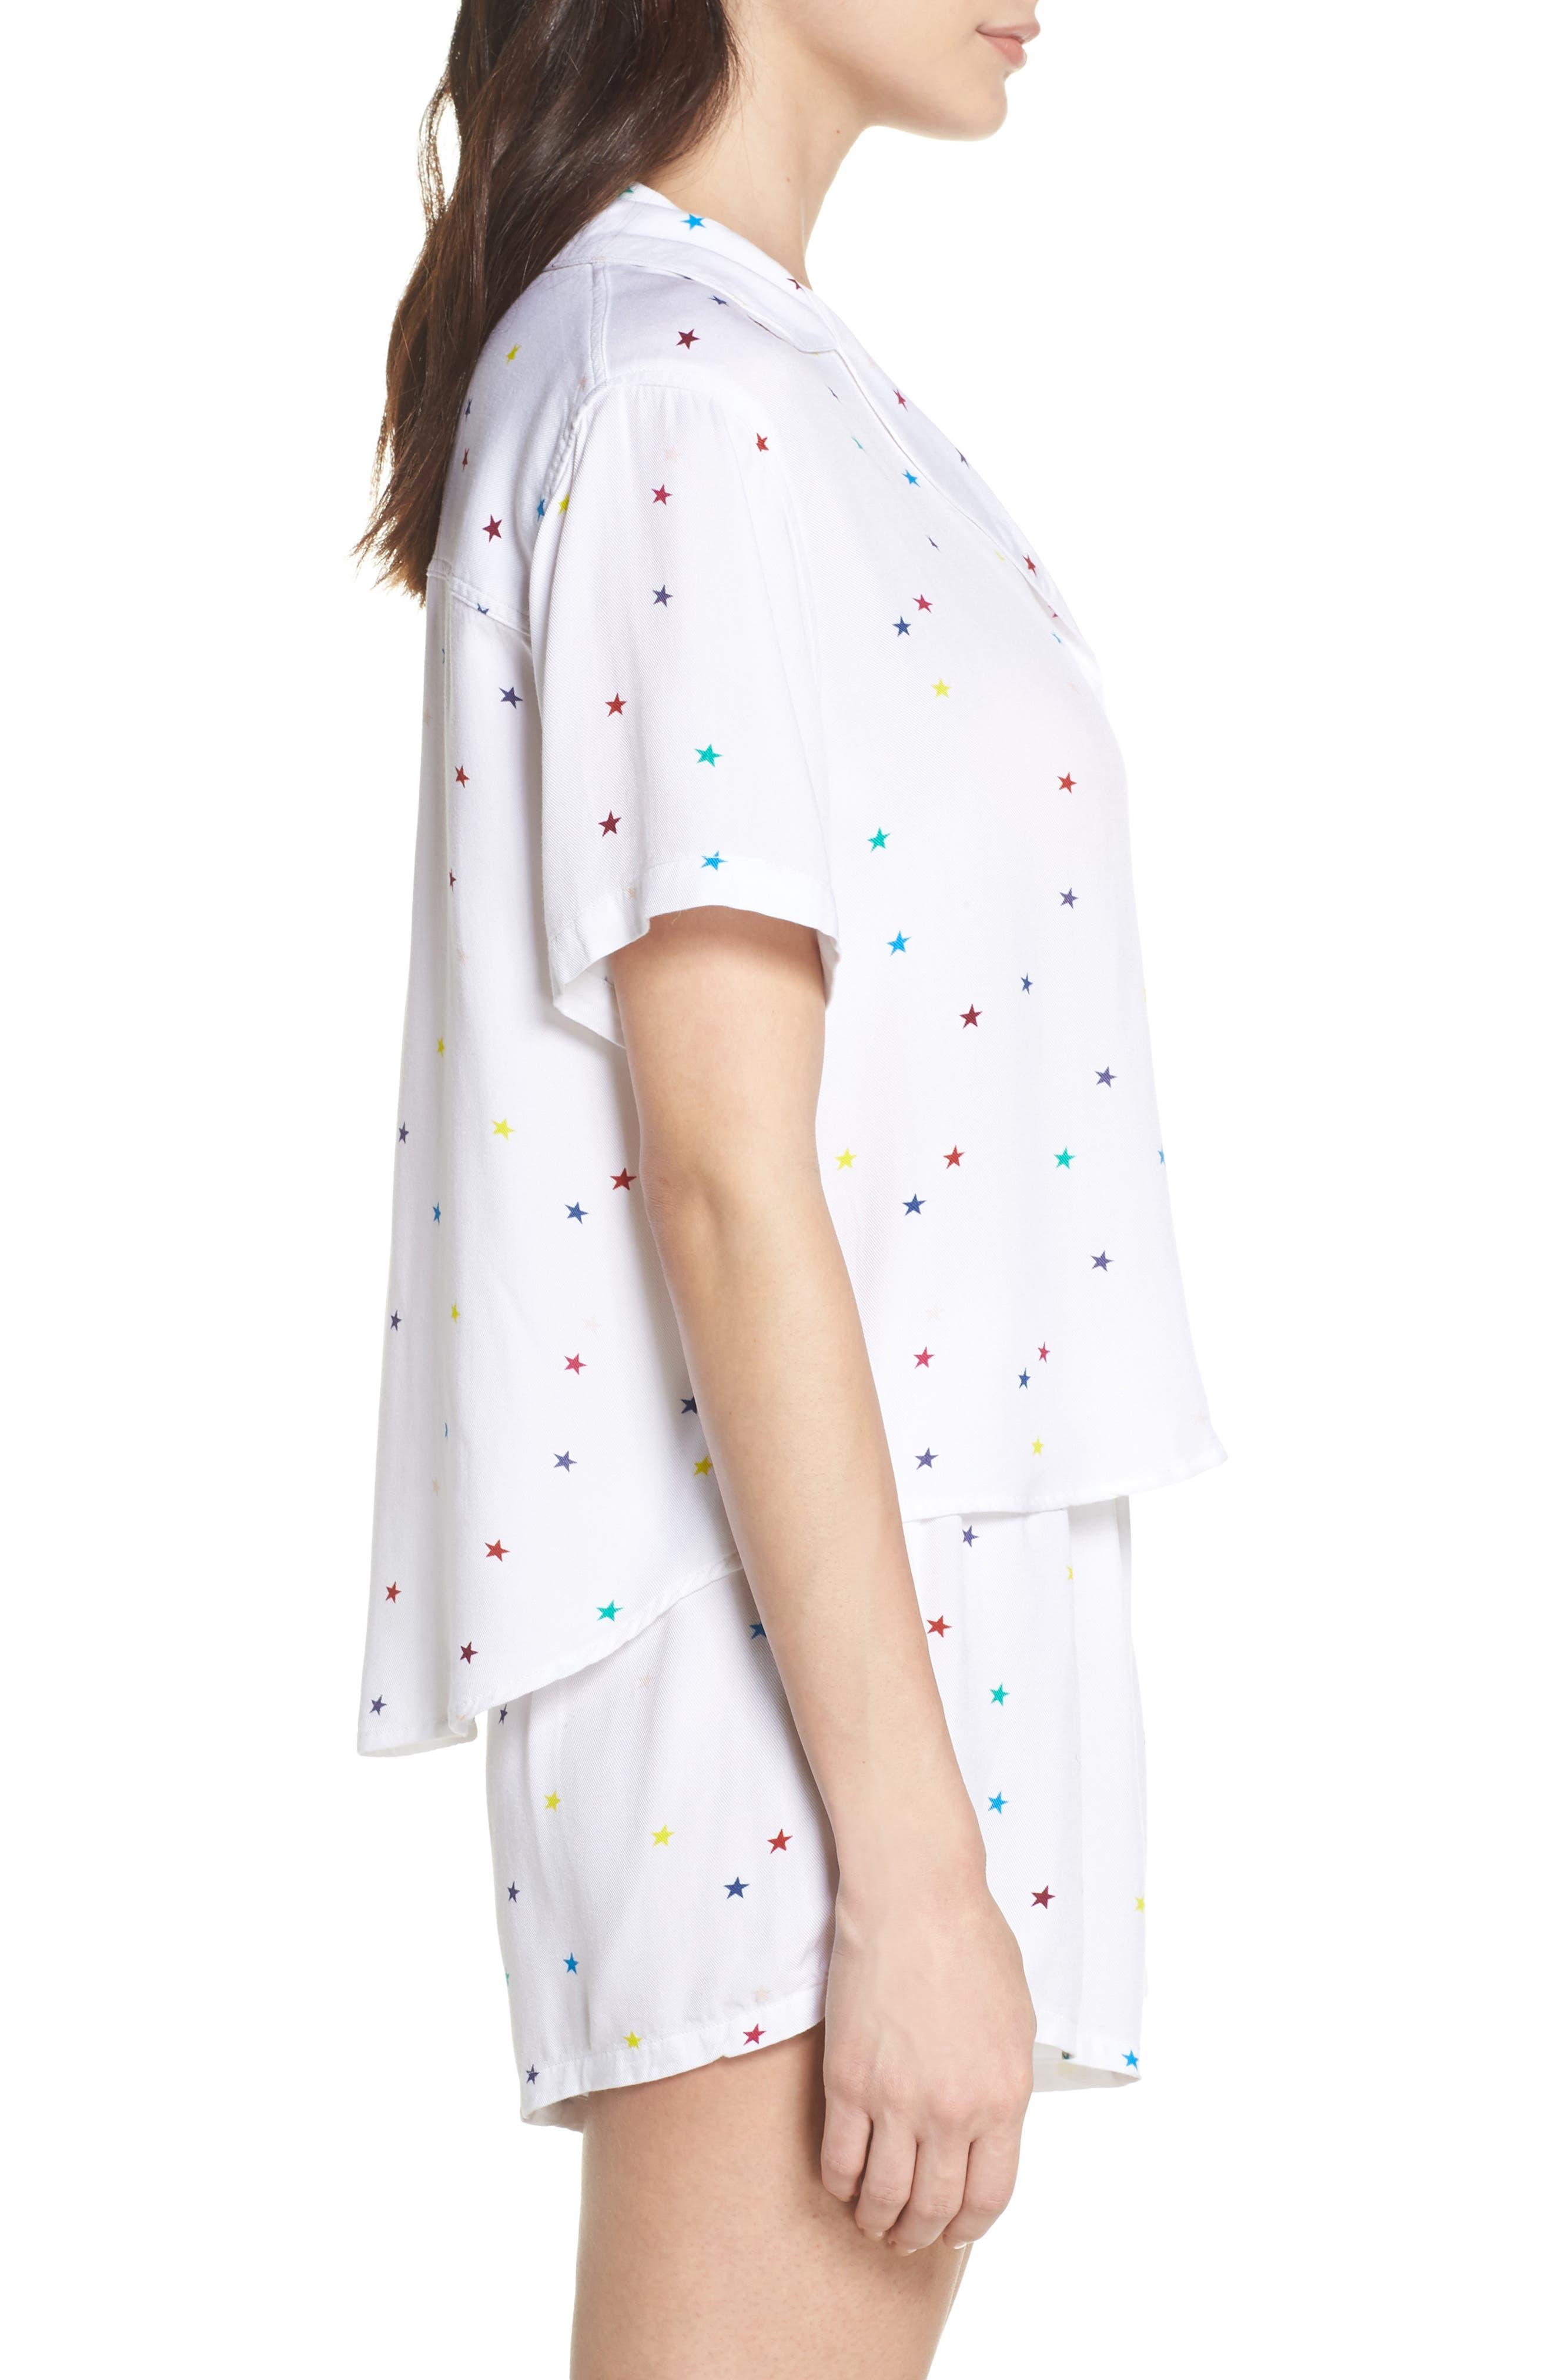 Star Print Short Pajamas,                             Alternate thumbnail 3, color,                             Rainbow Stars On White